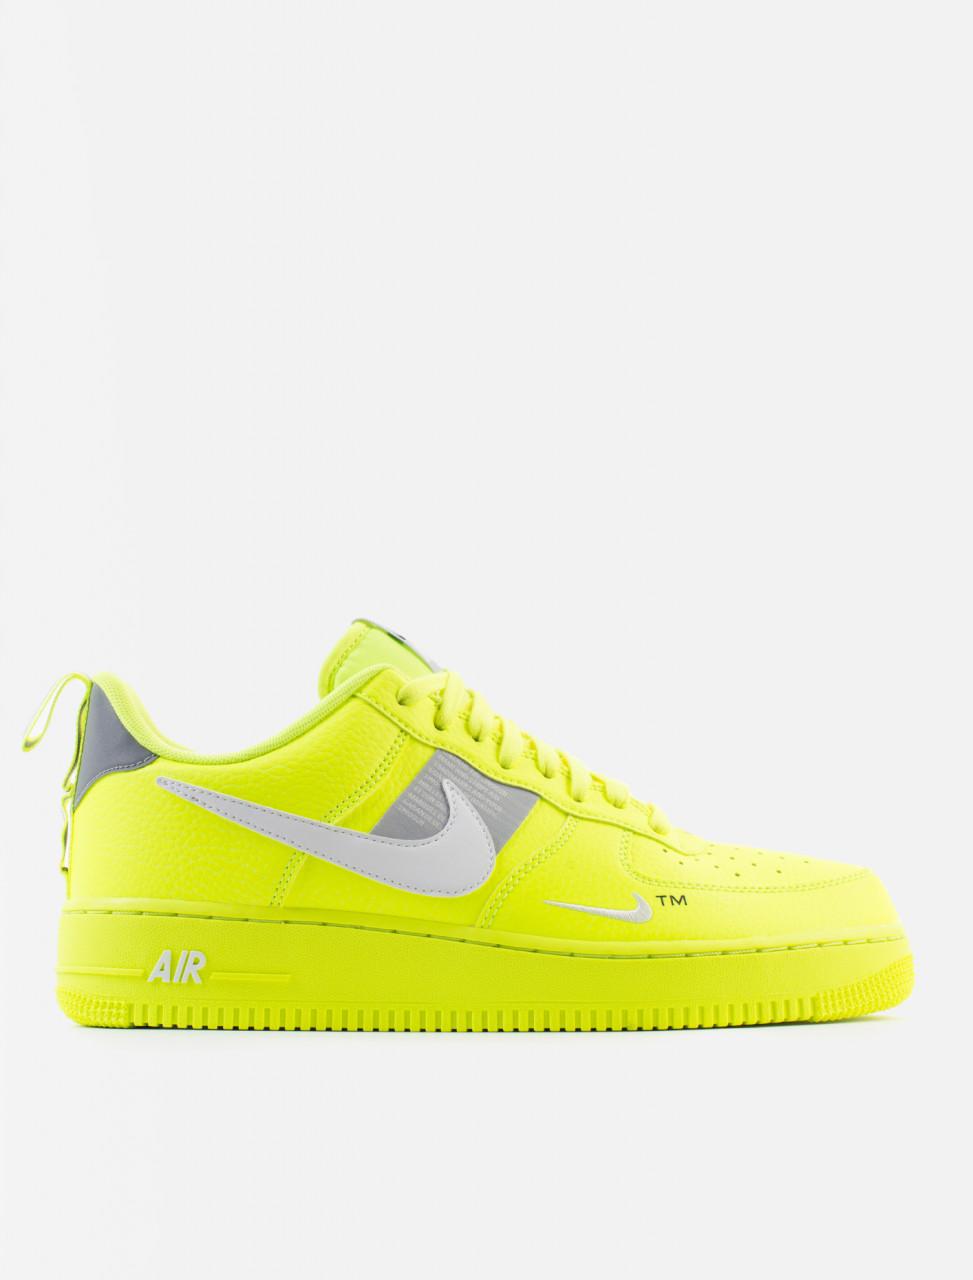 Nike Air Force Store 1 '07 LV8 Utility Sneaker Voo Store Force Berlin 4c11ed